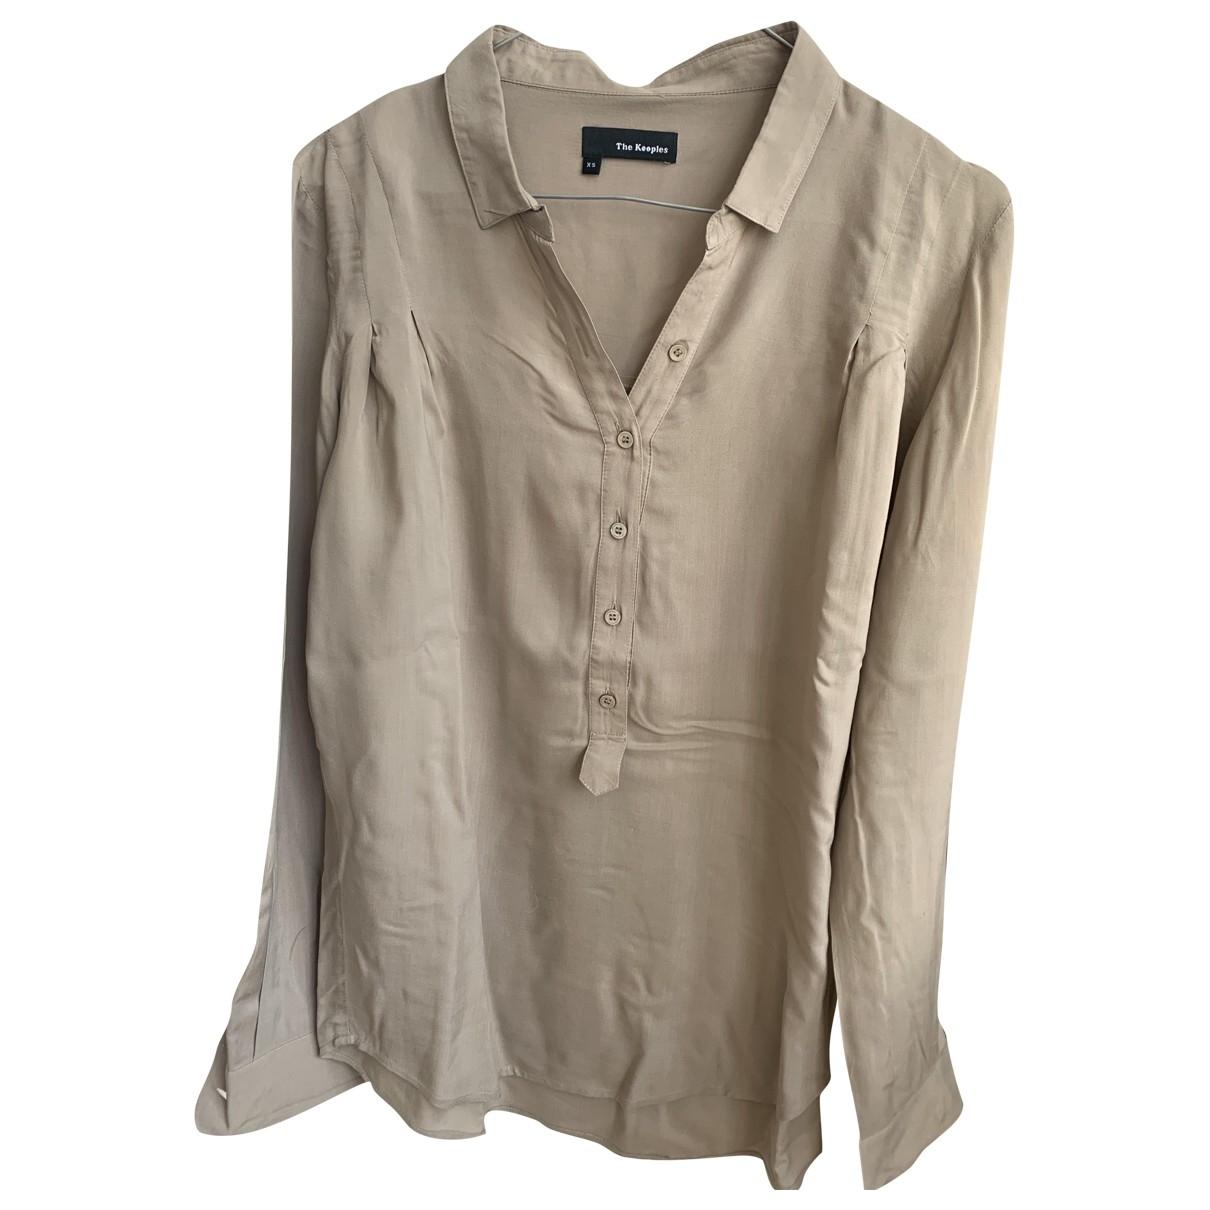 The Kooples \N Beige Cotton  top for Women 36 FR